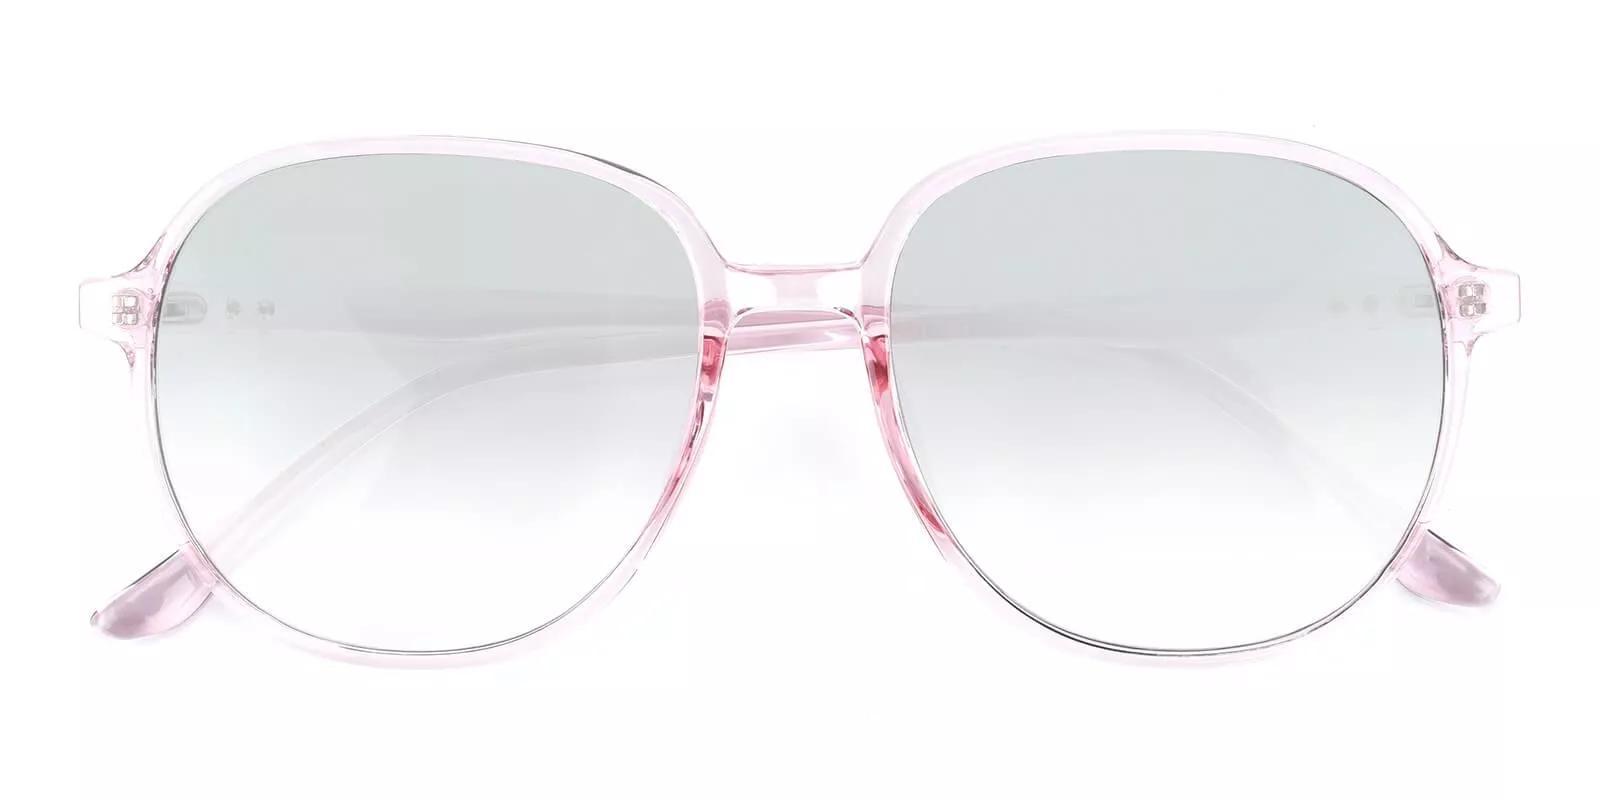 Palm Bay Prescription Sunglasses Clear Pink